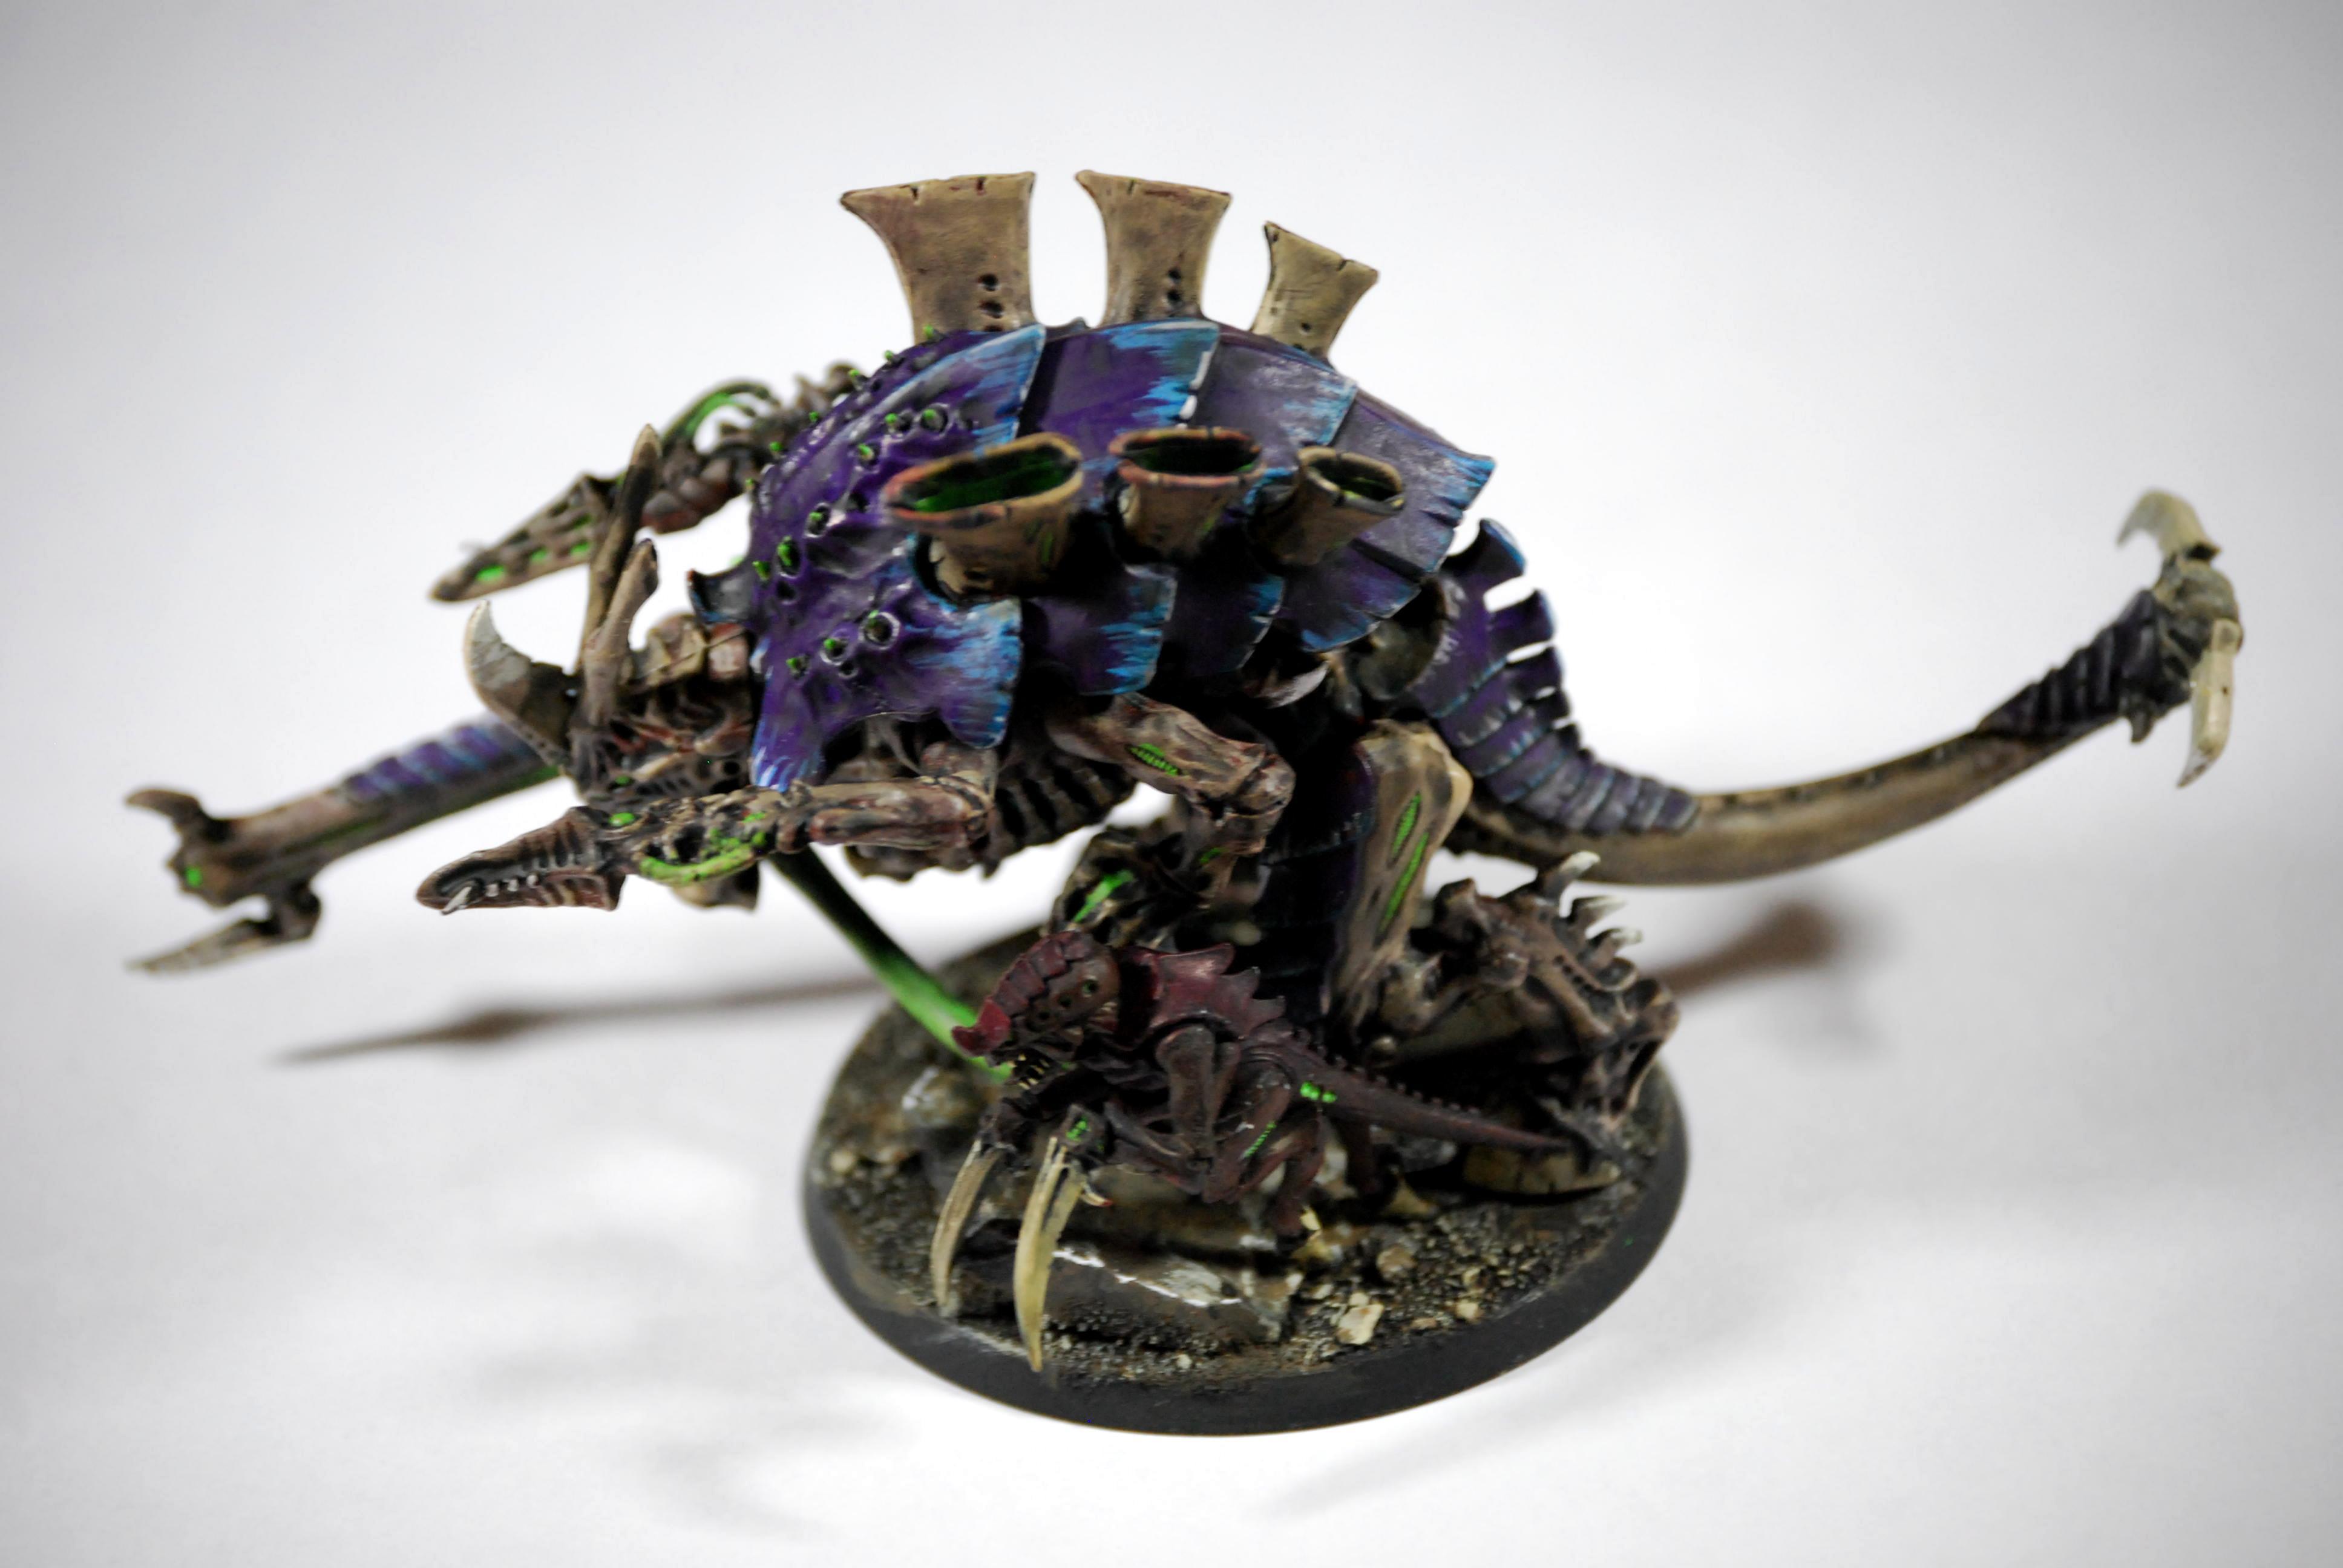 Carnifex, Tyranids, Warhammer 40,000